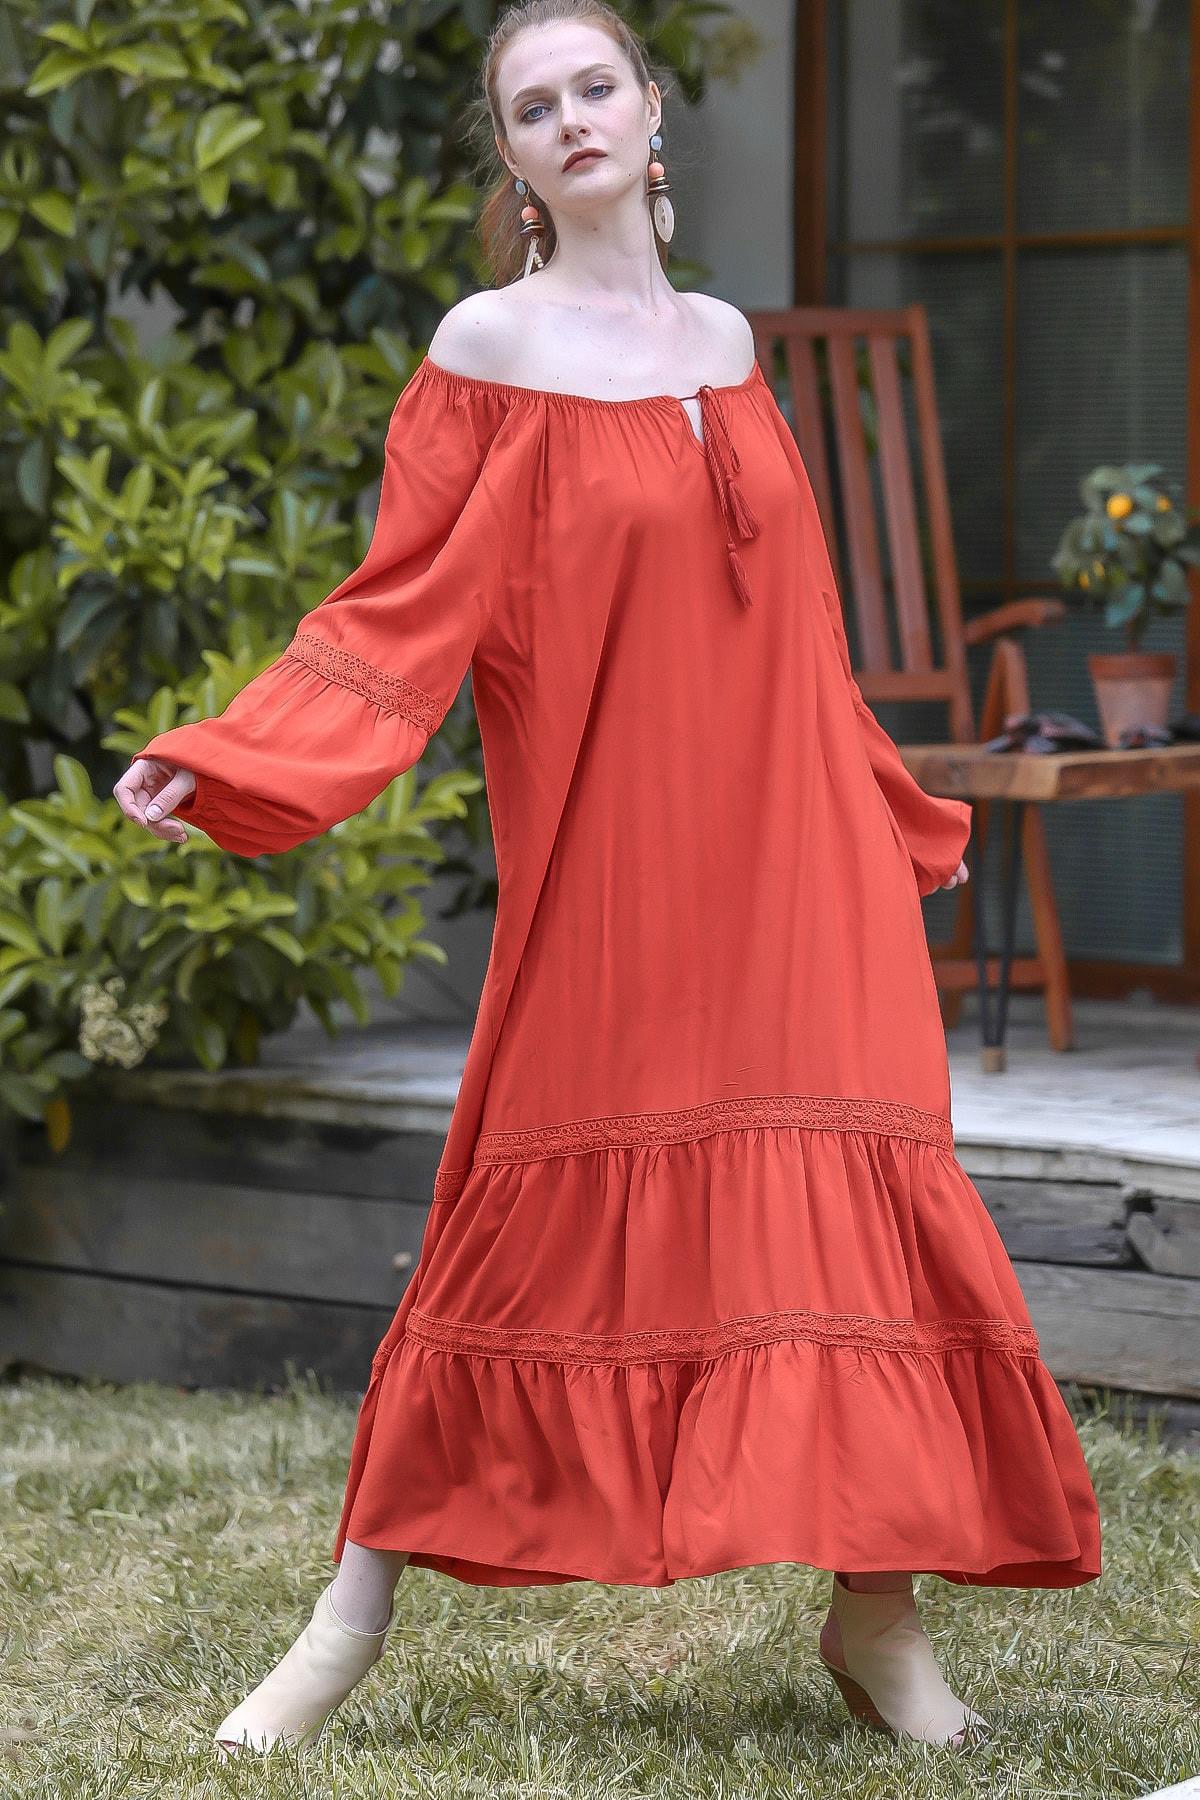 Chiccy Kadın Kiremit Carmen Yaka Kopanaki Detaylı Kolları Lastikli Salaş Dokuma Elbise M10160000EL94889